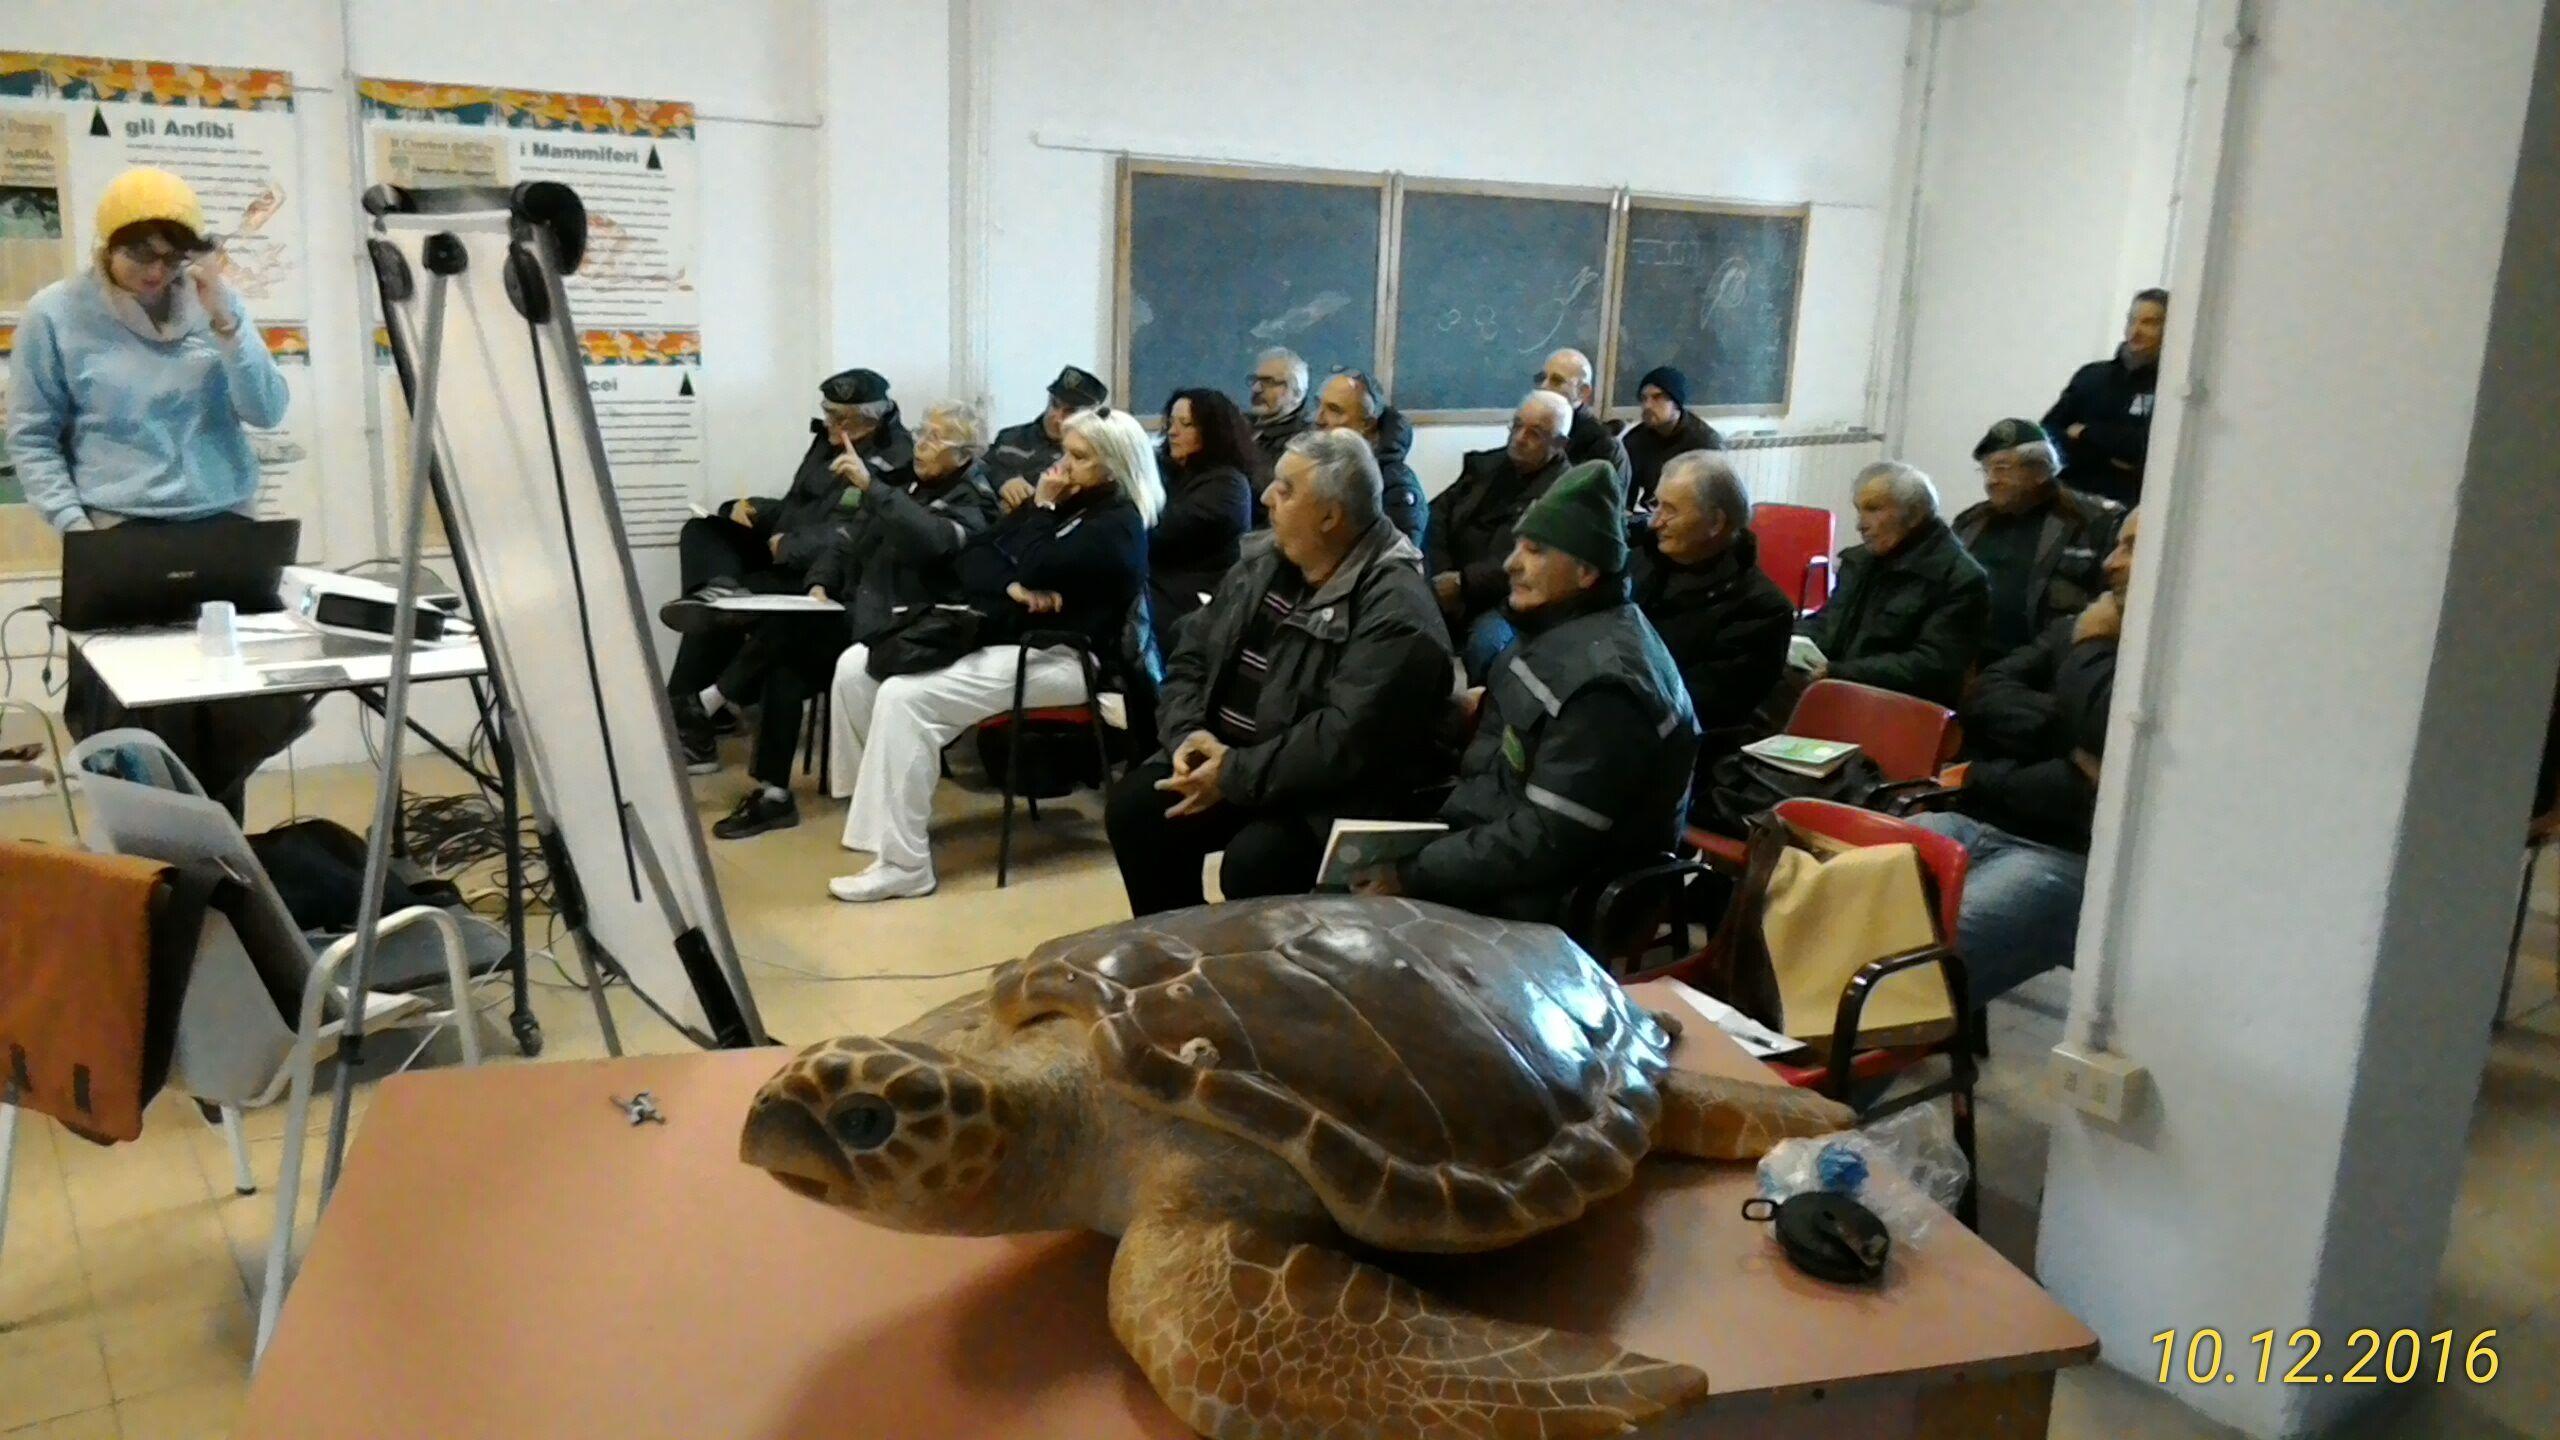 Primo soccorso tartarughe marine guardie ecologiche for Vasche per tartarughe marine